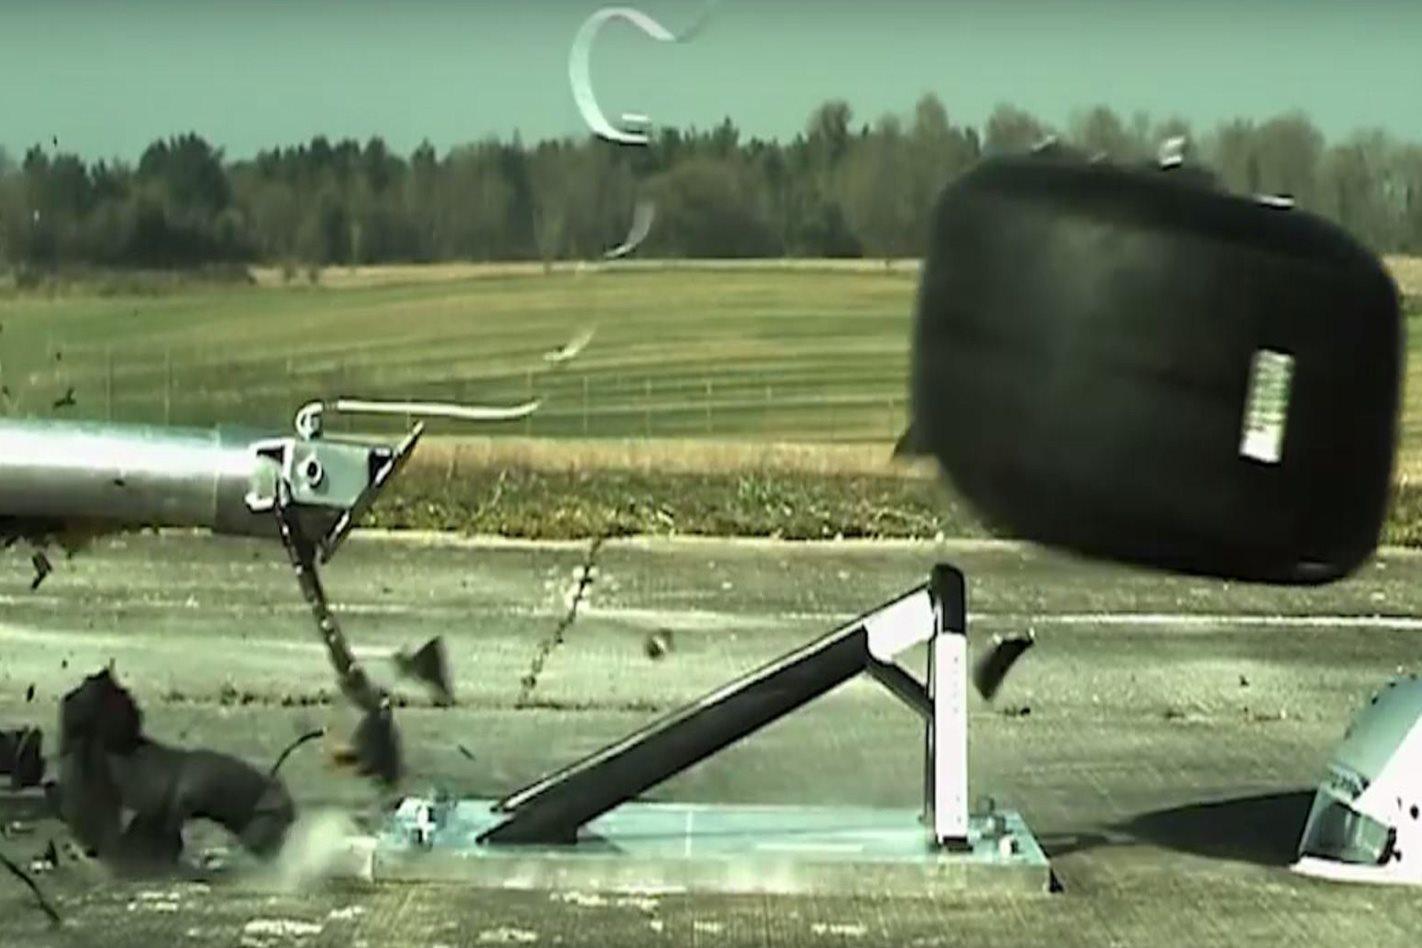 Halo Effect testing